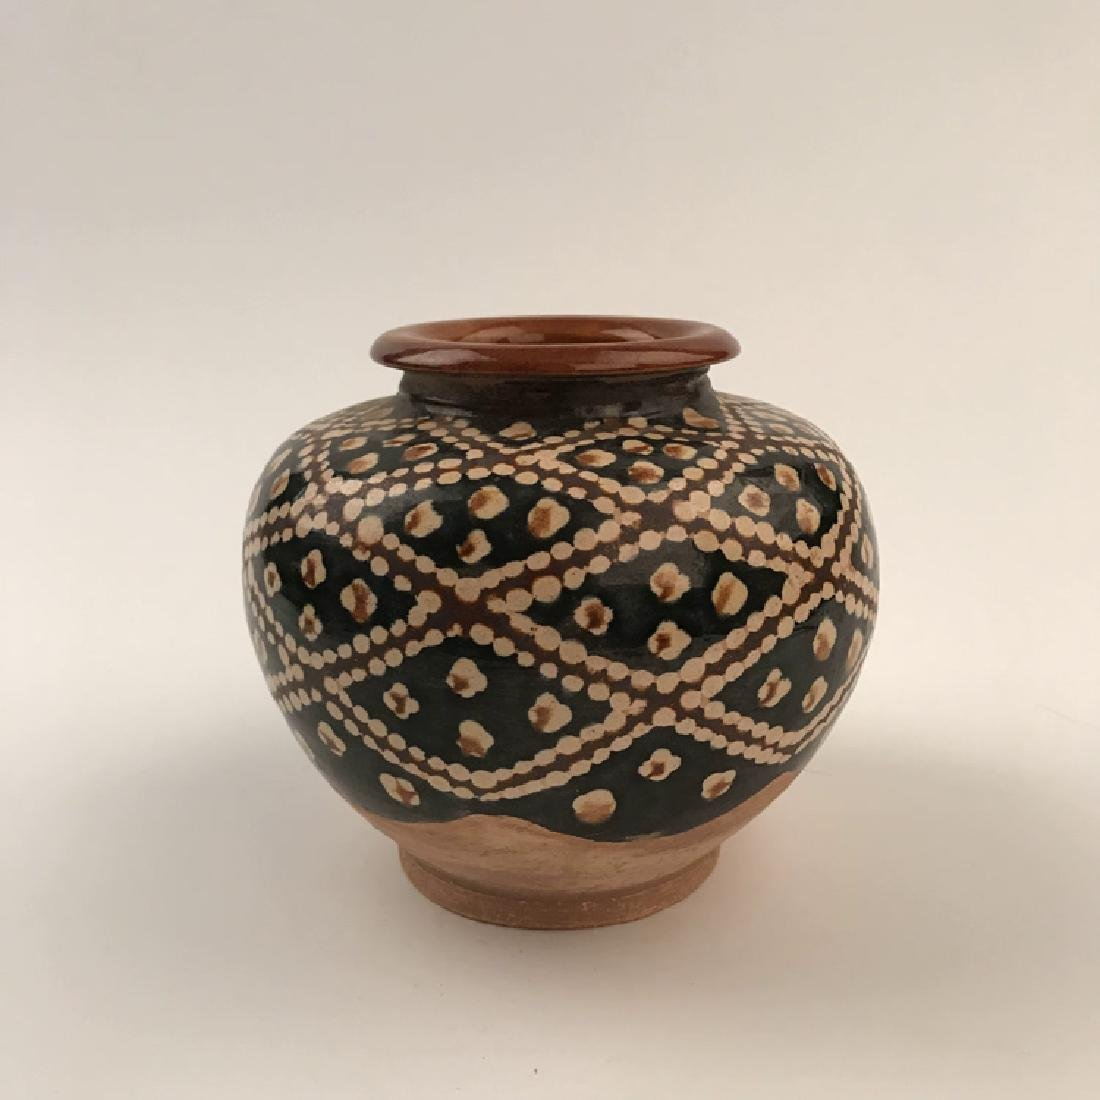 Chinese Sancai Pottery Jar - 6